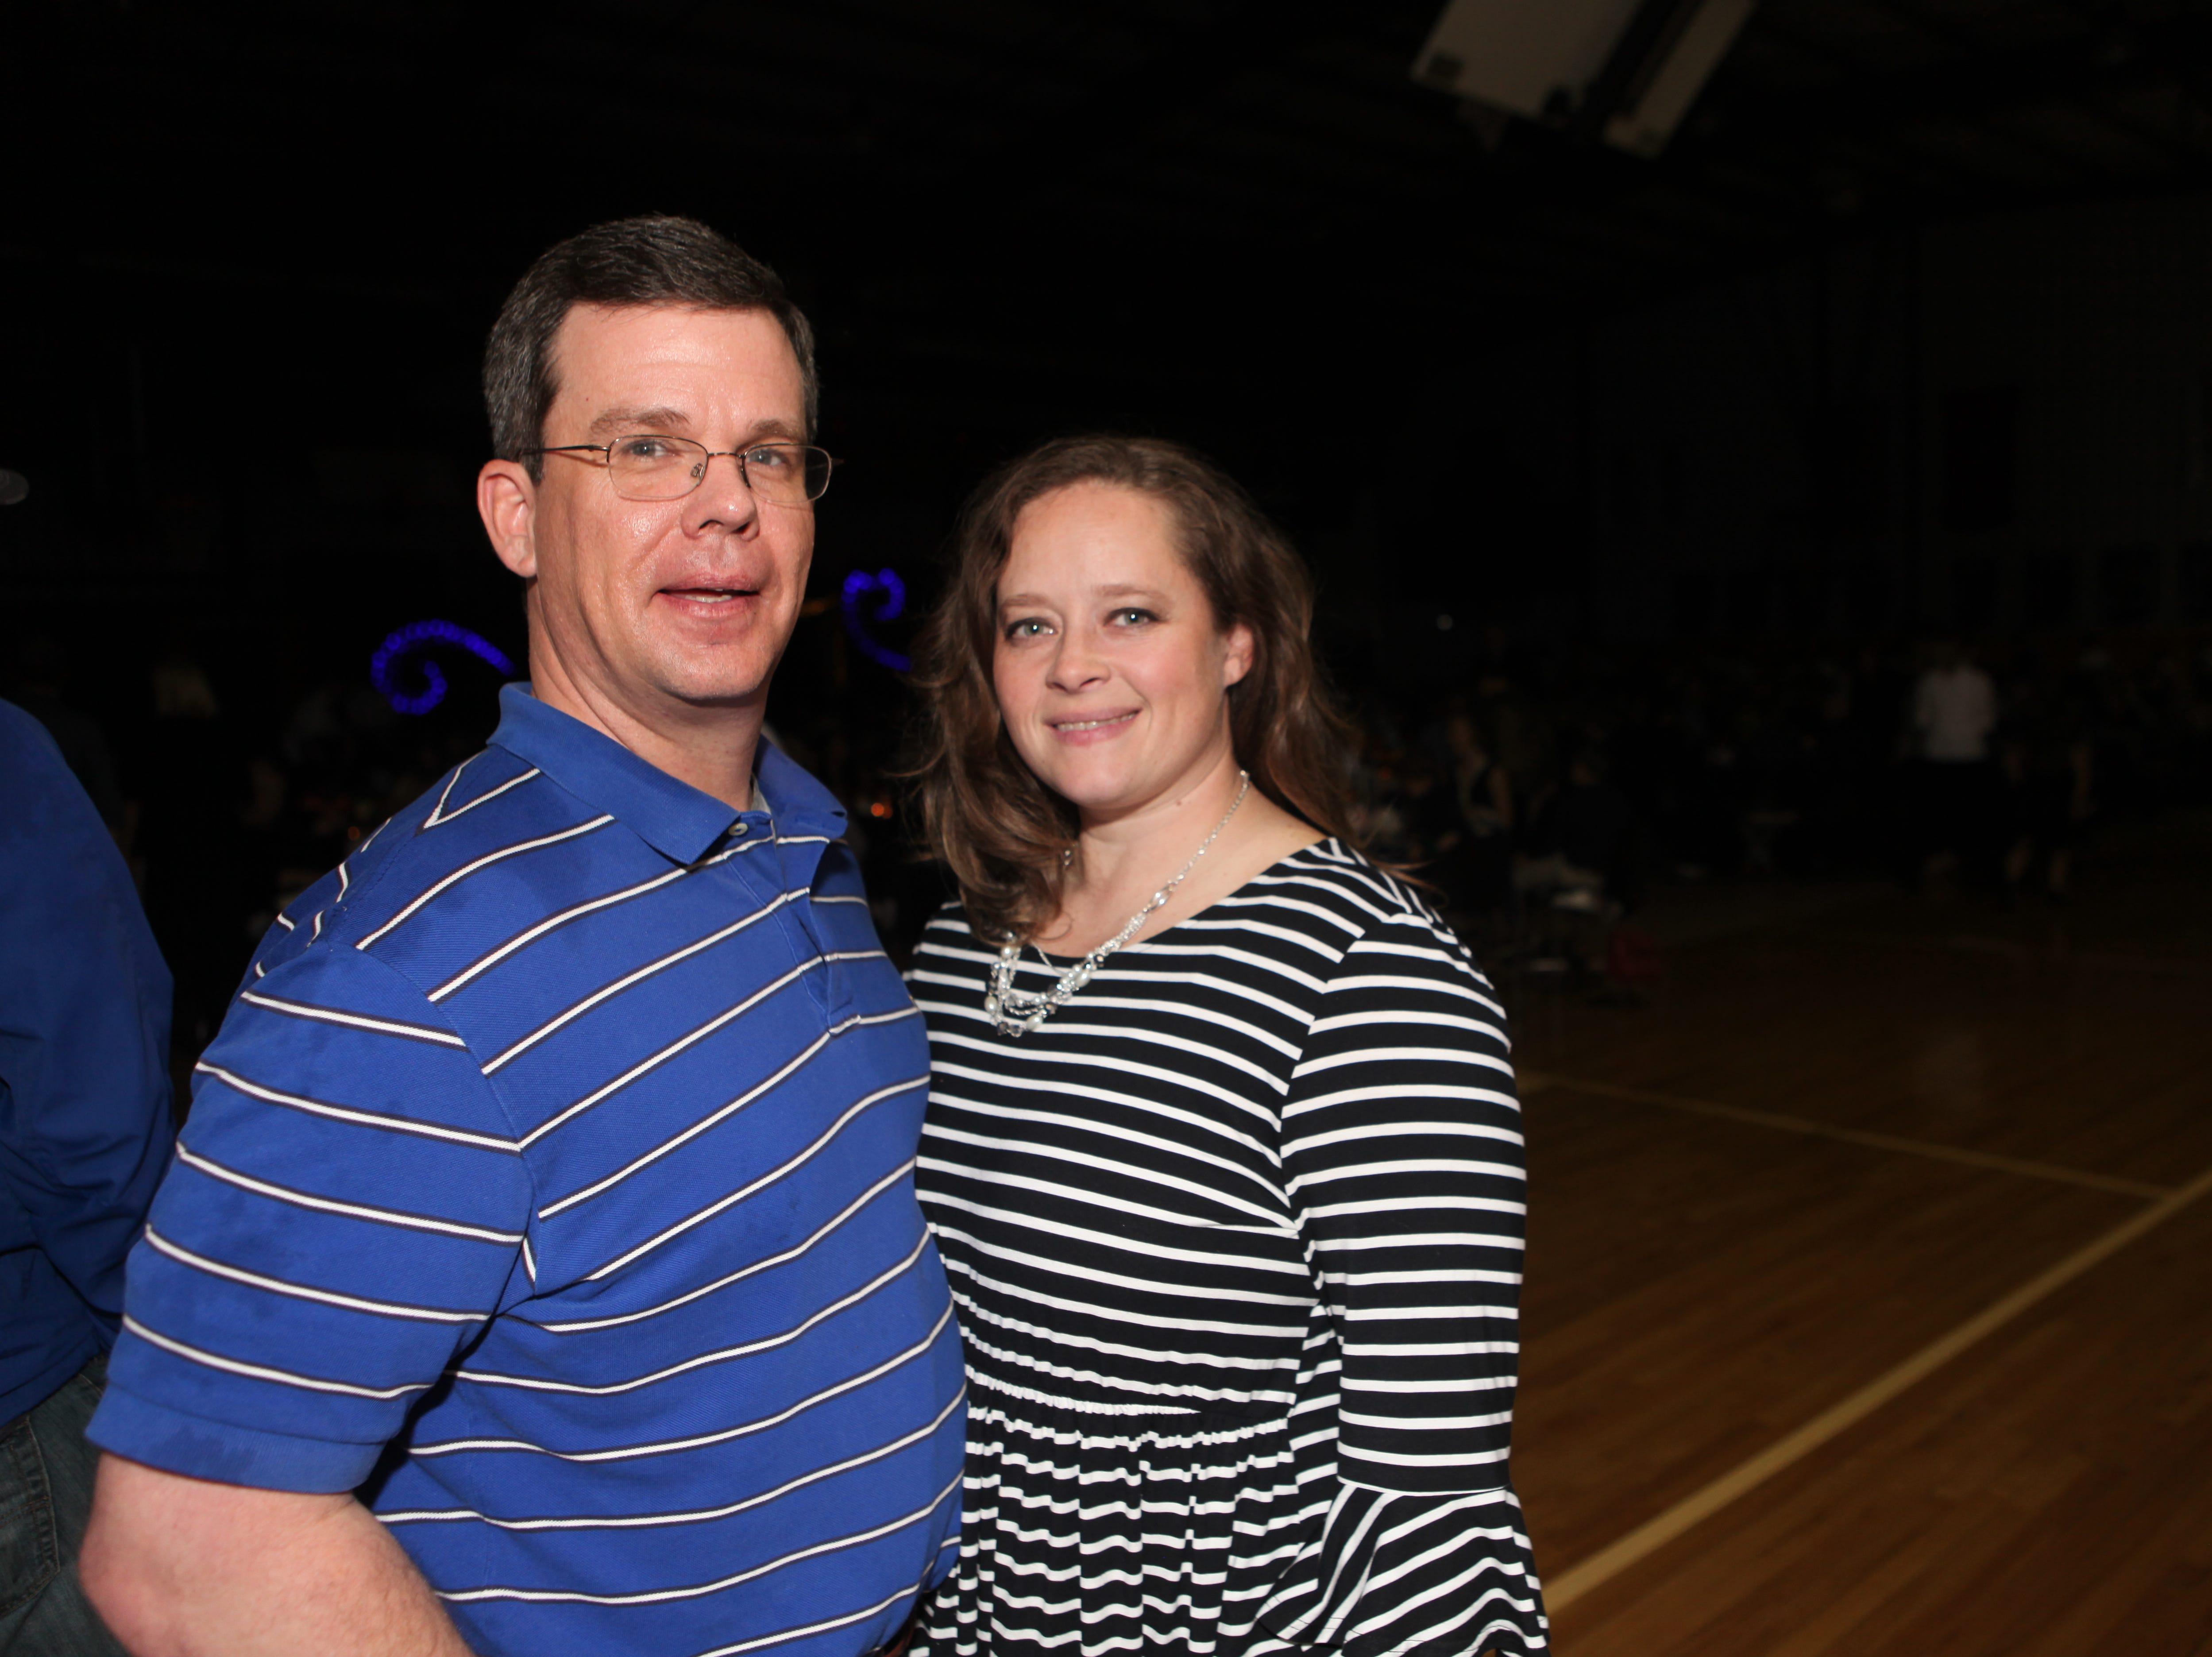 Cara and Matt Miller at Clarksville Academy's Steak Dinner on Saturday, April 13, 2019.